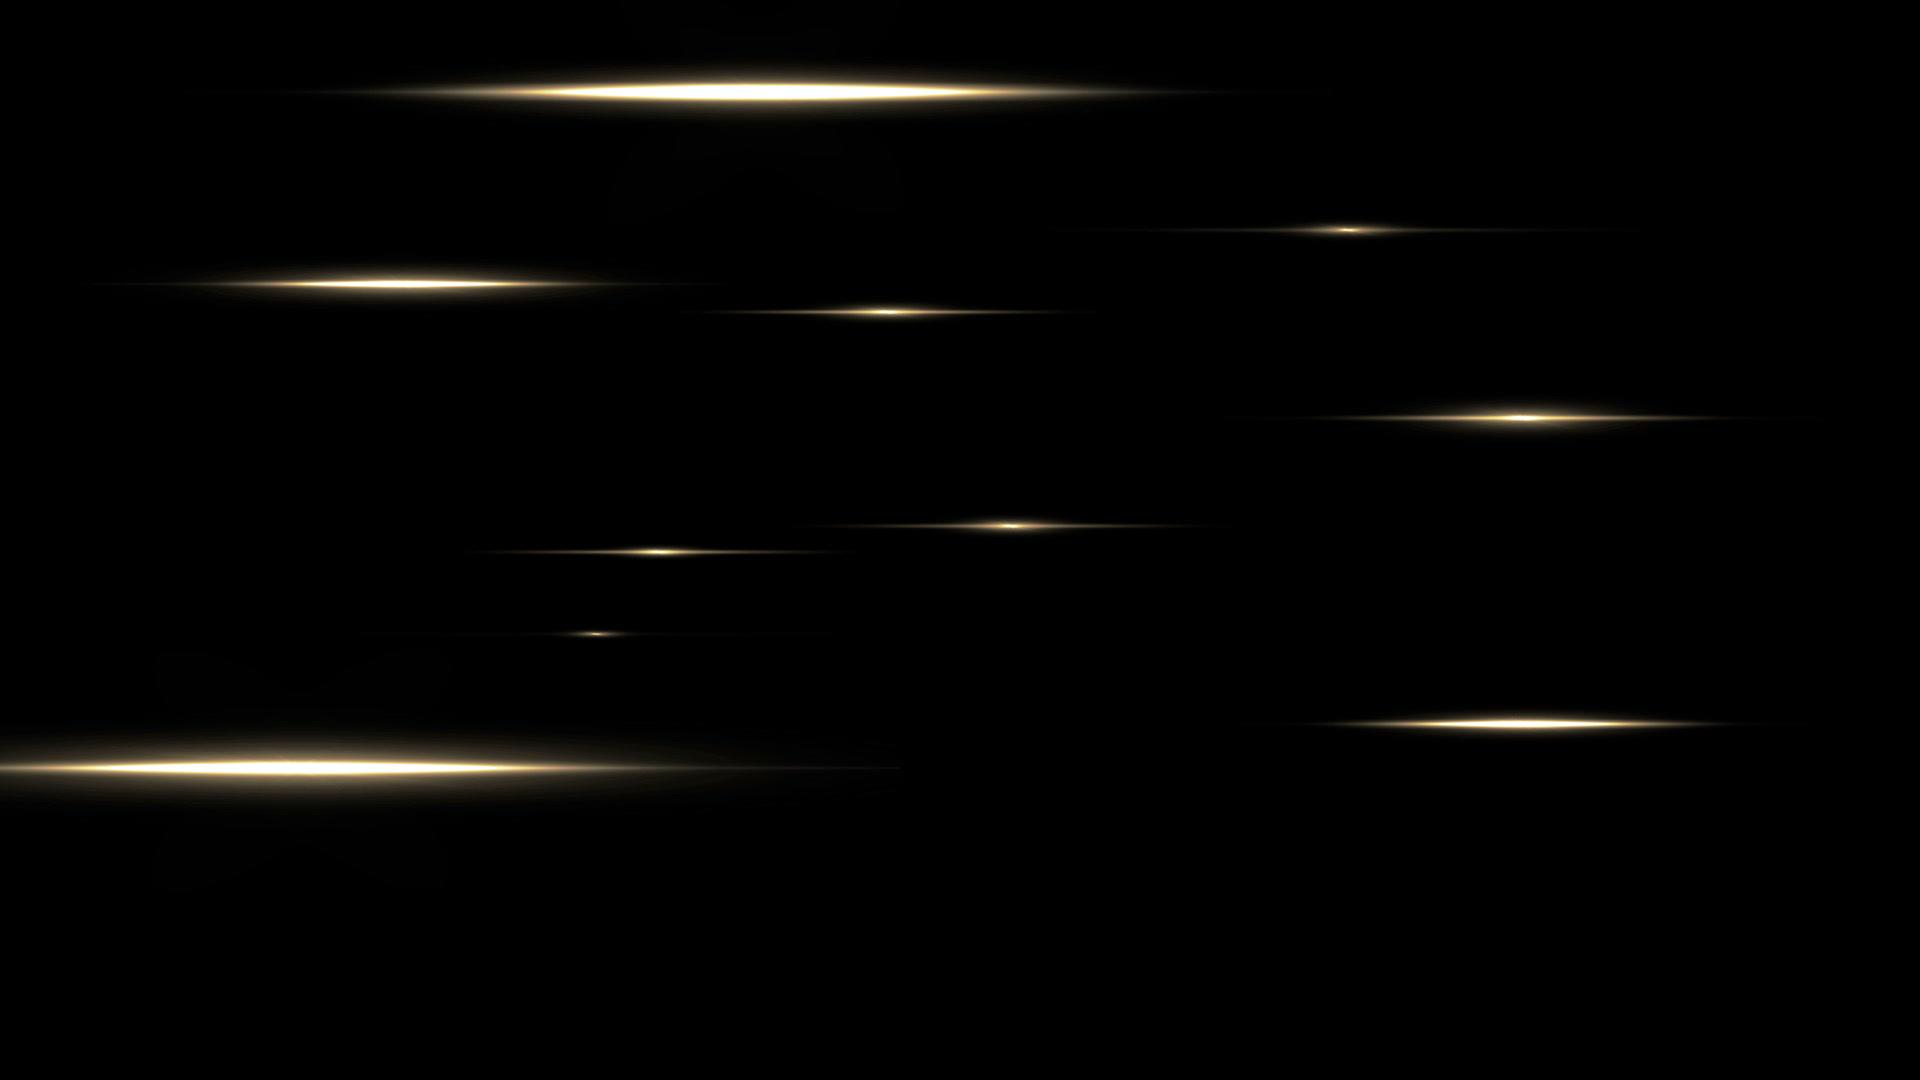 Light-Gold-Stings-VJ-Loop-LIMEART_007 VJ Loops Farm - Video Loops & VJ Clips